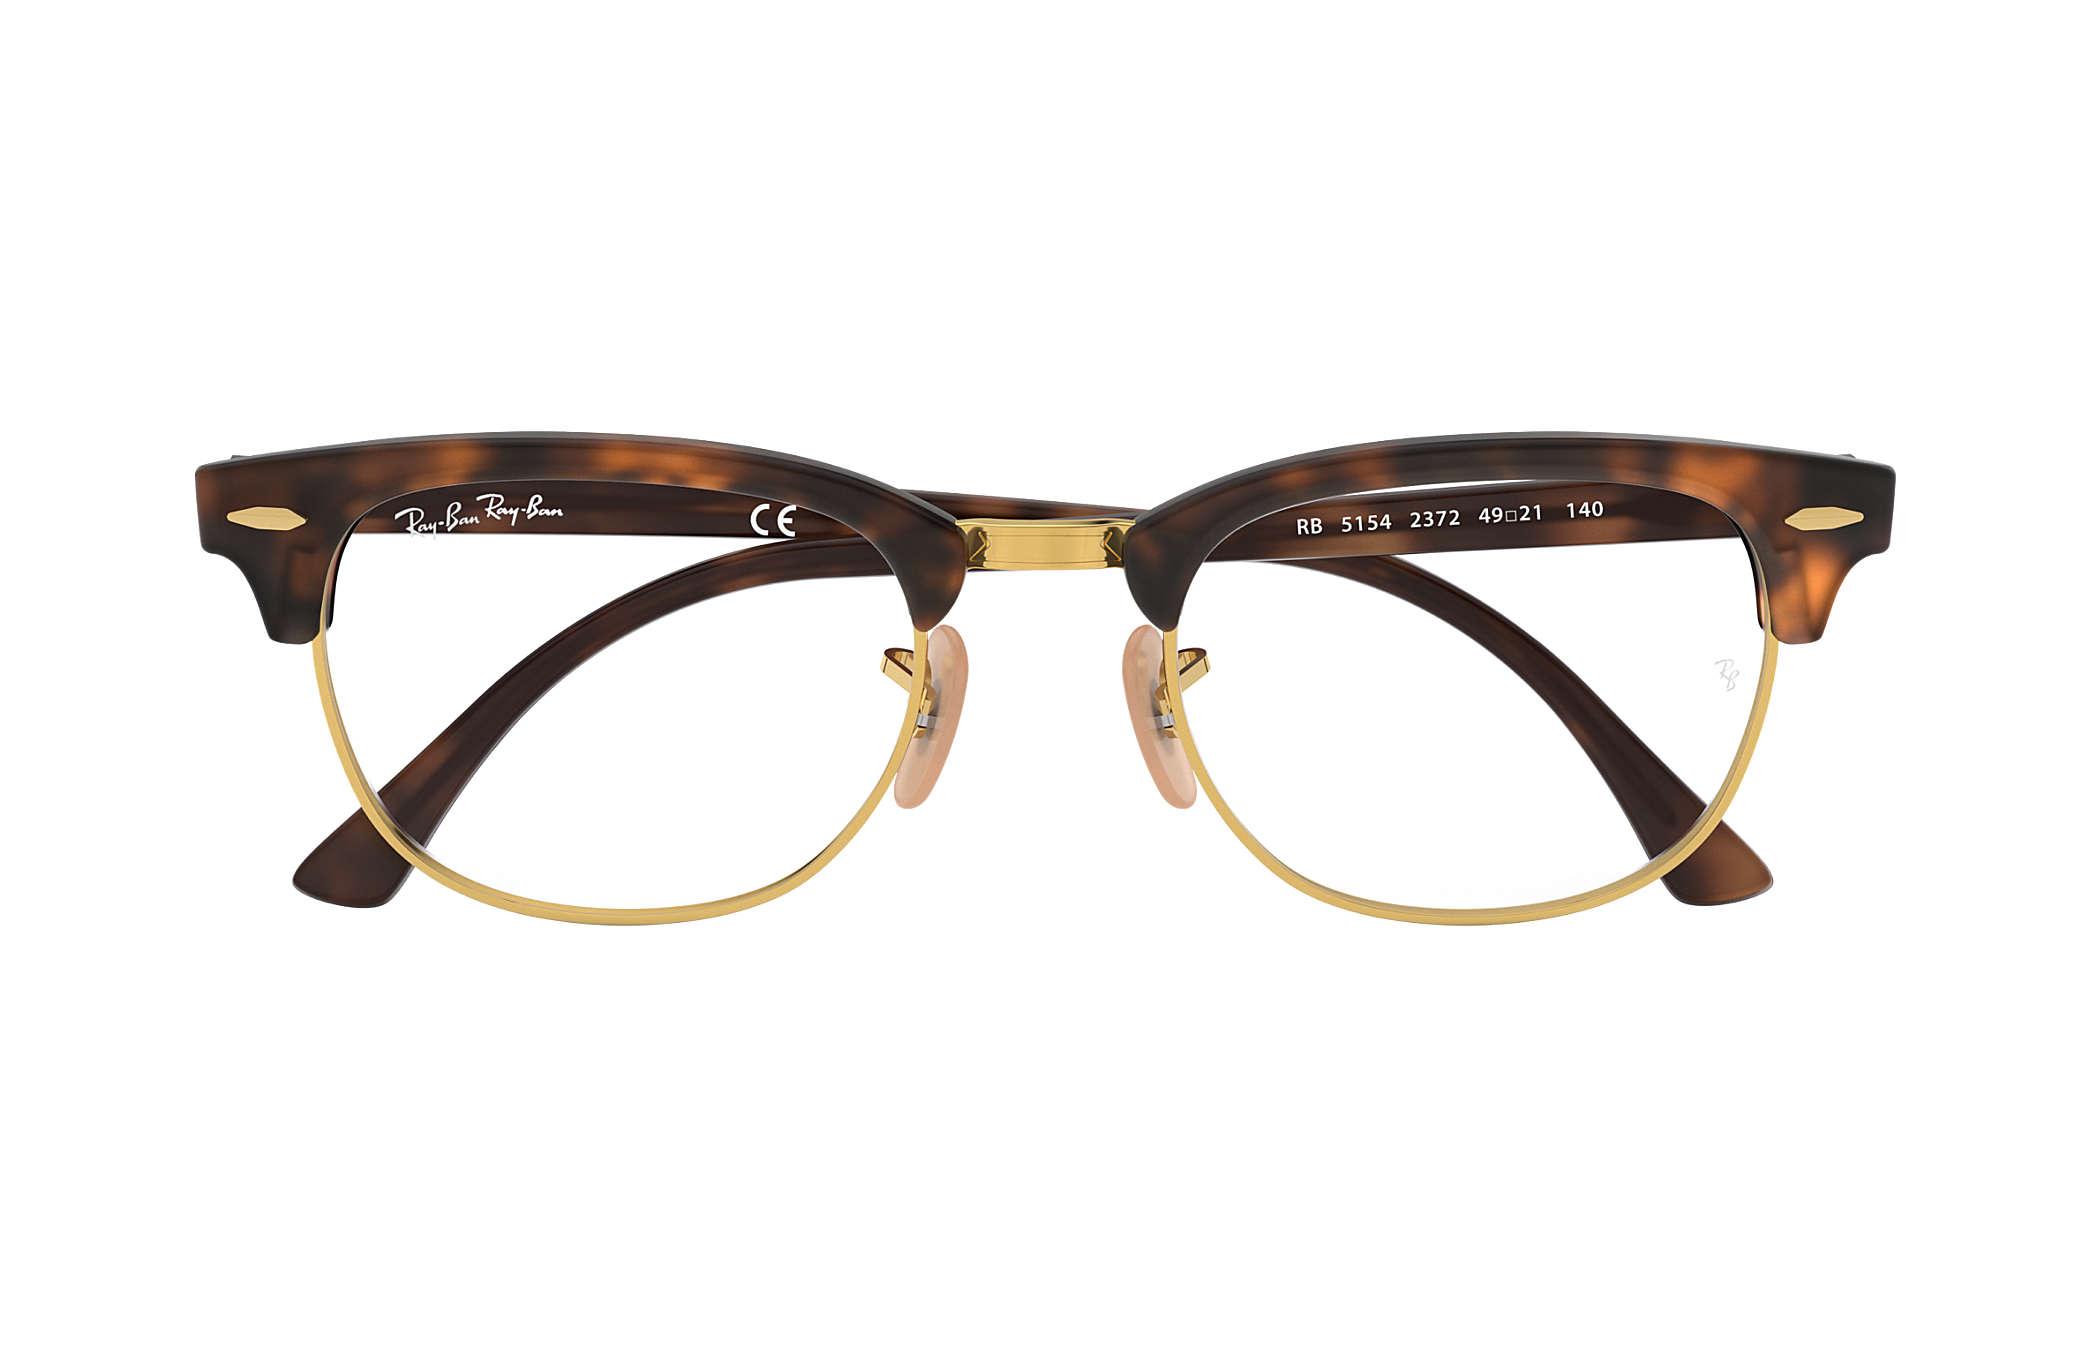 1ee4c38e64 Ray-Ban eyeglasses Clubmaster Optics RB5154 Tortoise - Acetate ...